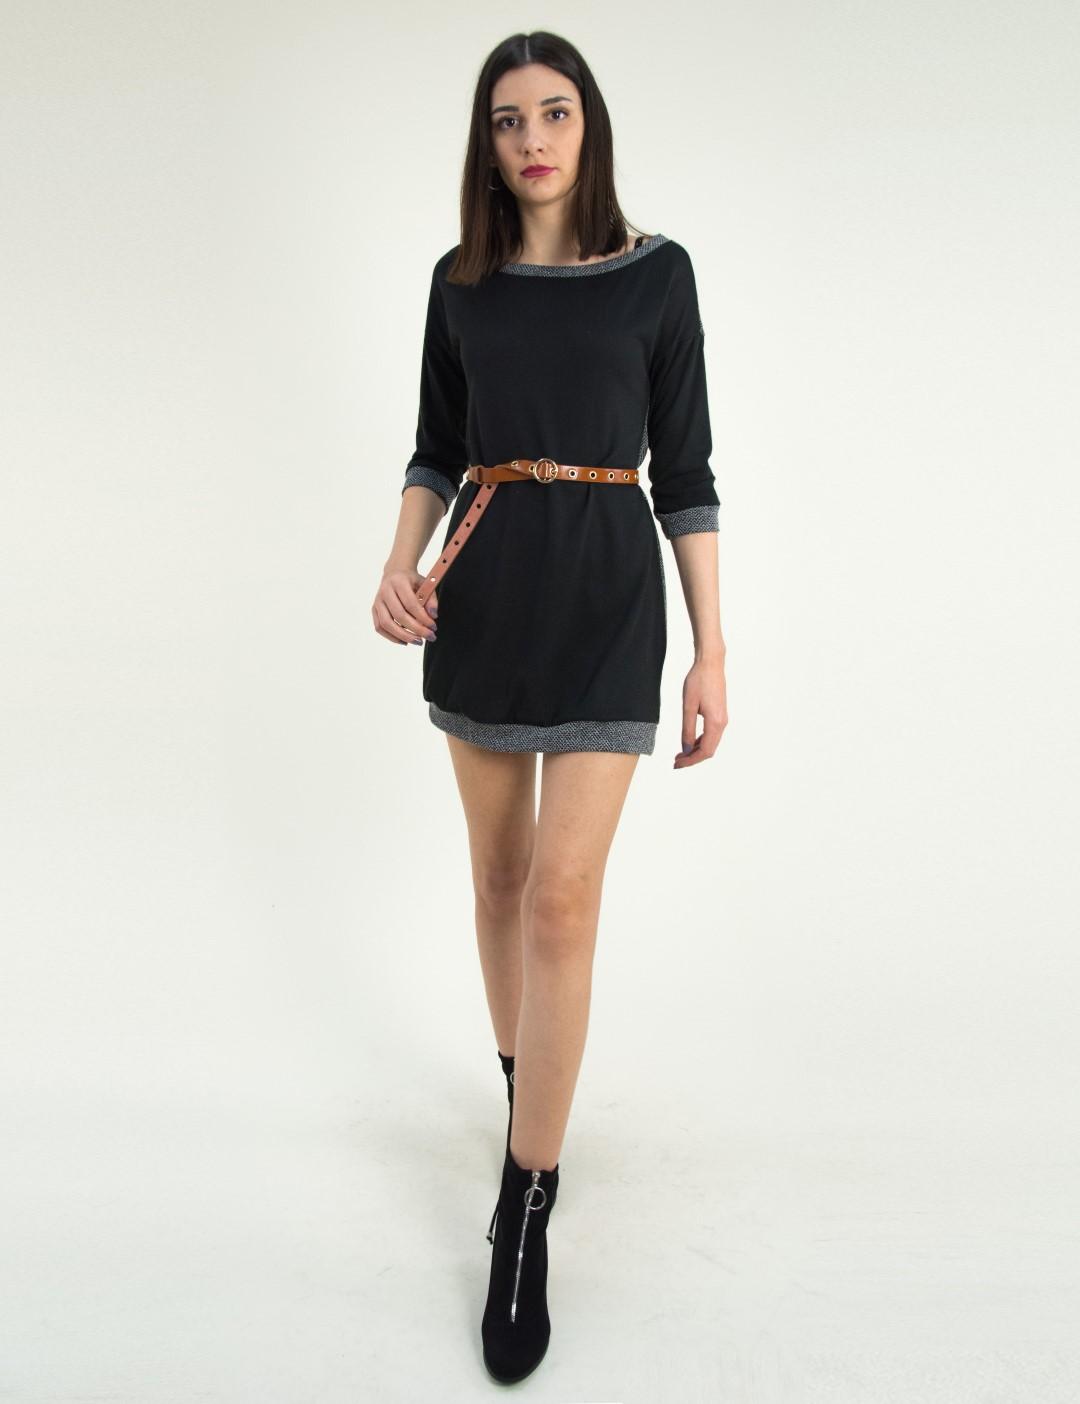 ace384d2c96b Γυναικείο μαύρο φόρεμα με ζακάρ σχέδιο κοντό μανίκι 91098G